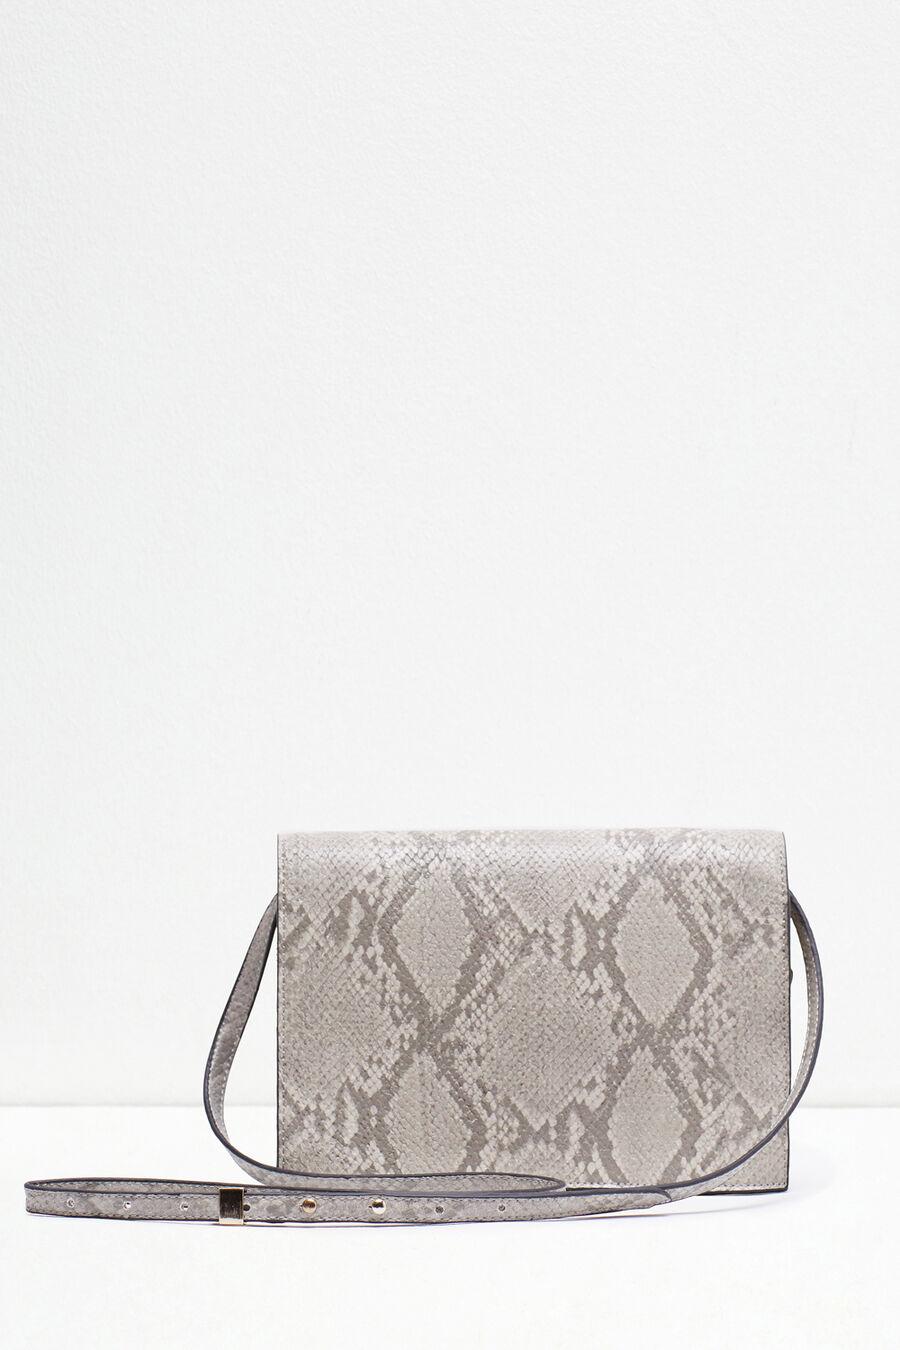 Snakeskin print purse